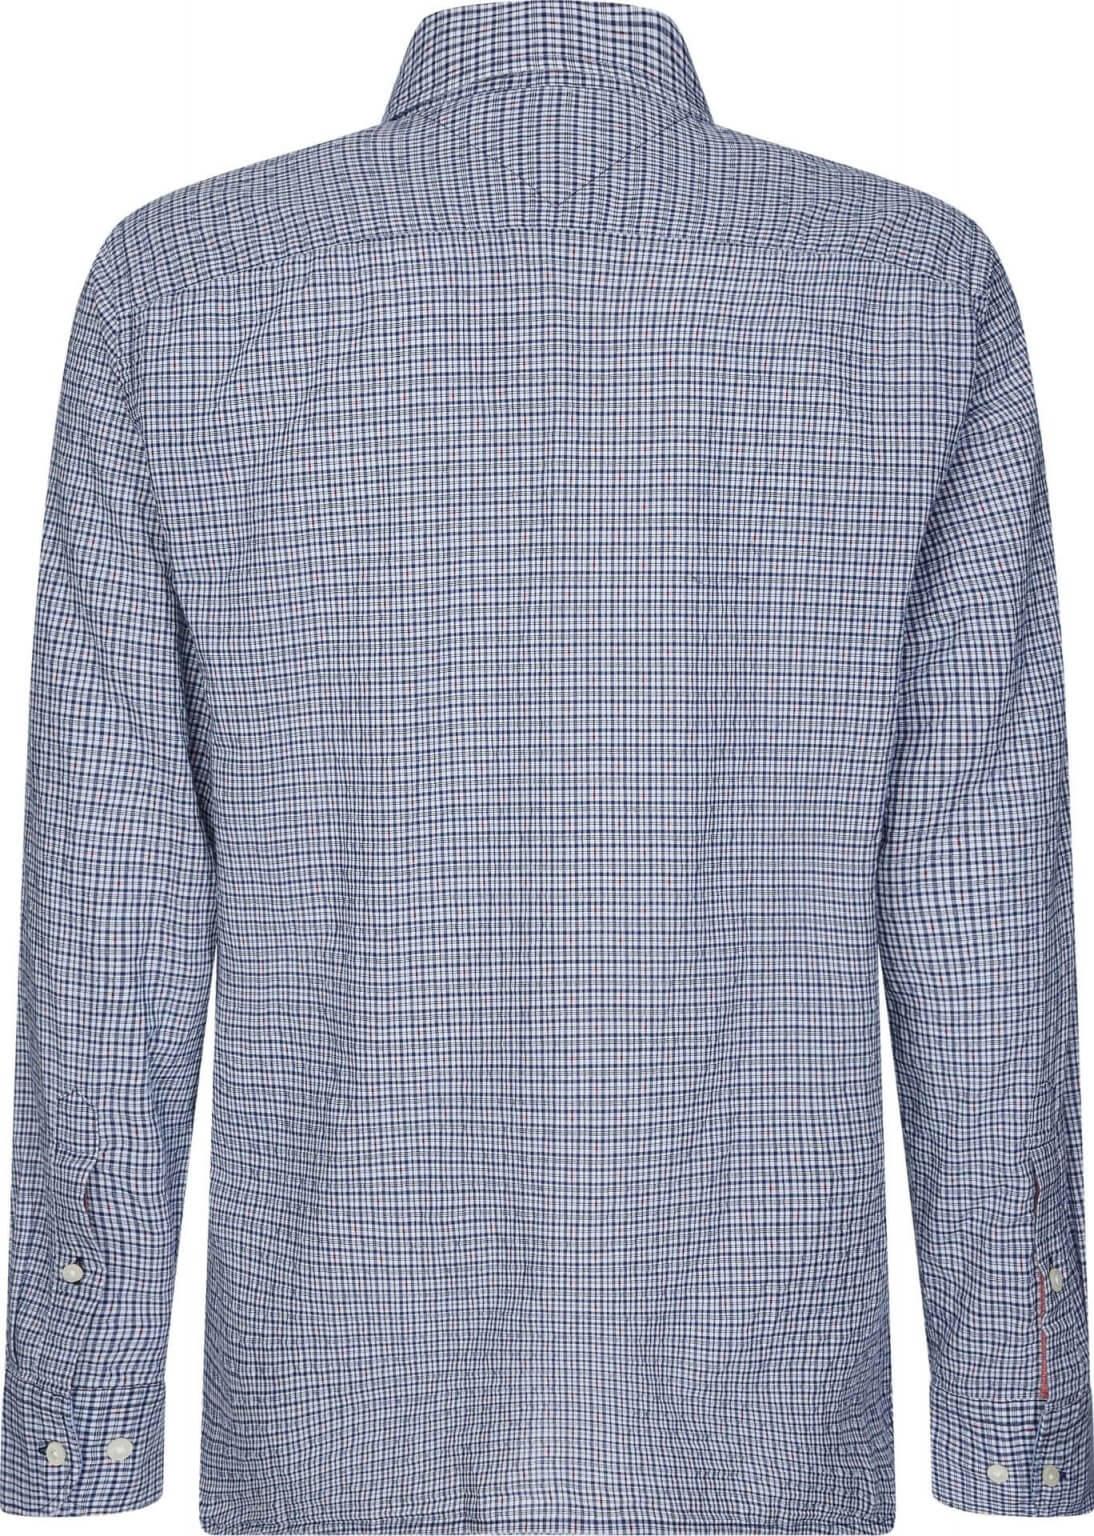 Tommy Hilfiger Long Sleeve Checkered Shirt